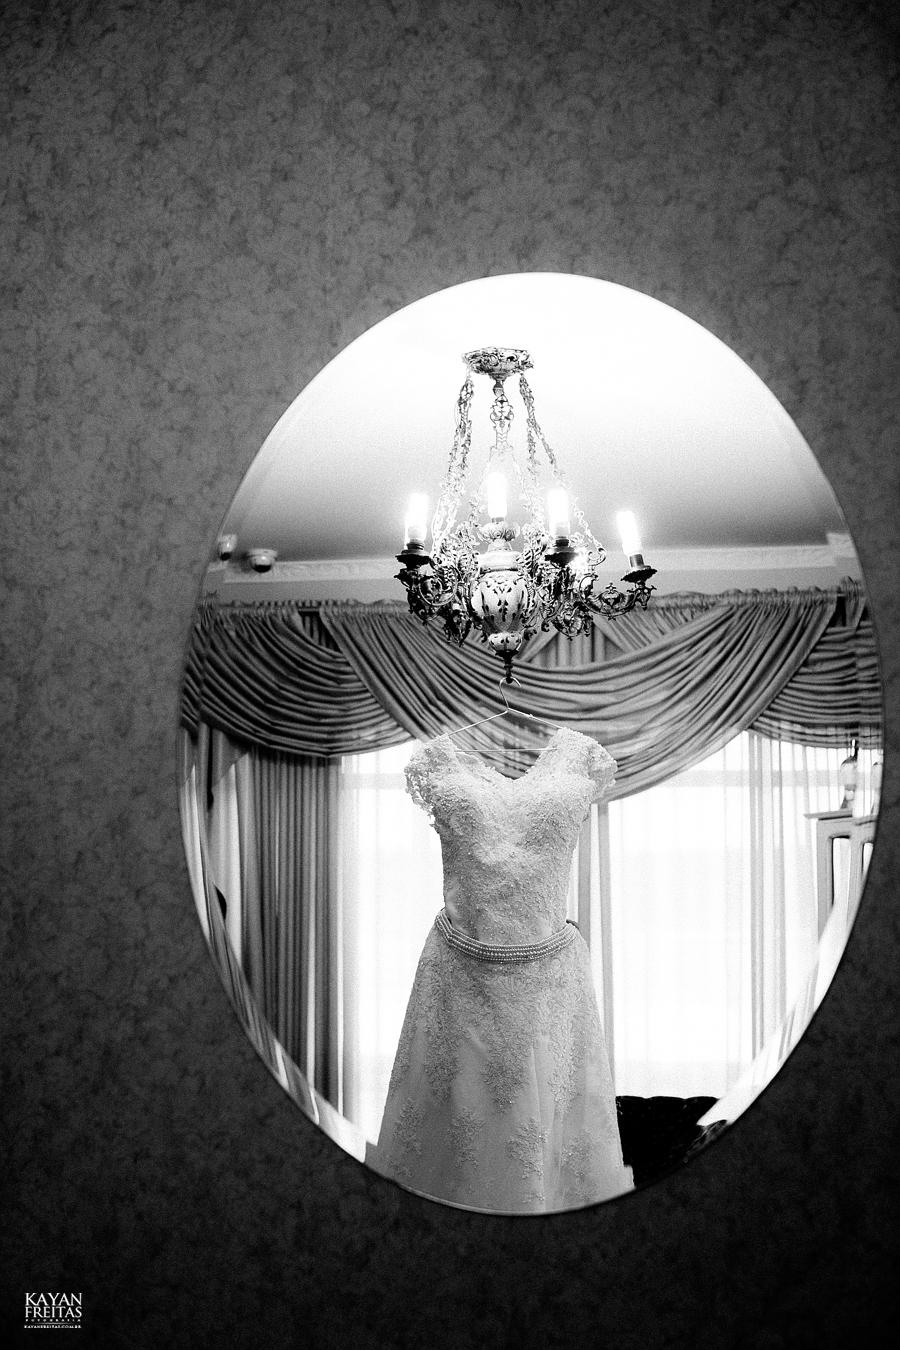 larissa-junior-casamento-0001 Larissa + Junior - Casamento em Biguaçu